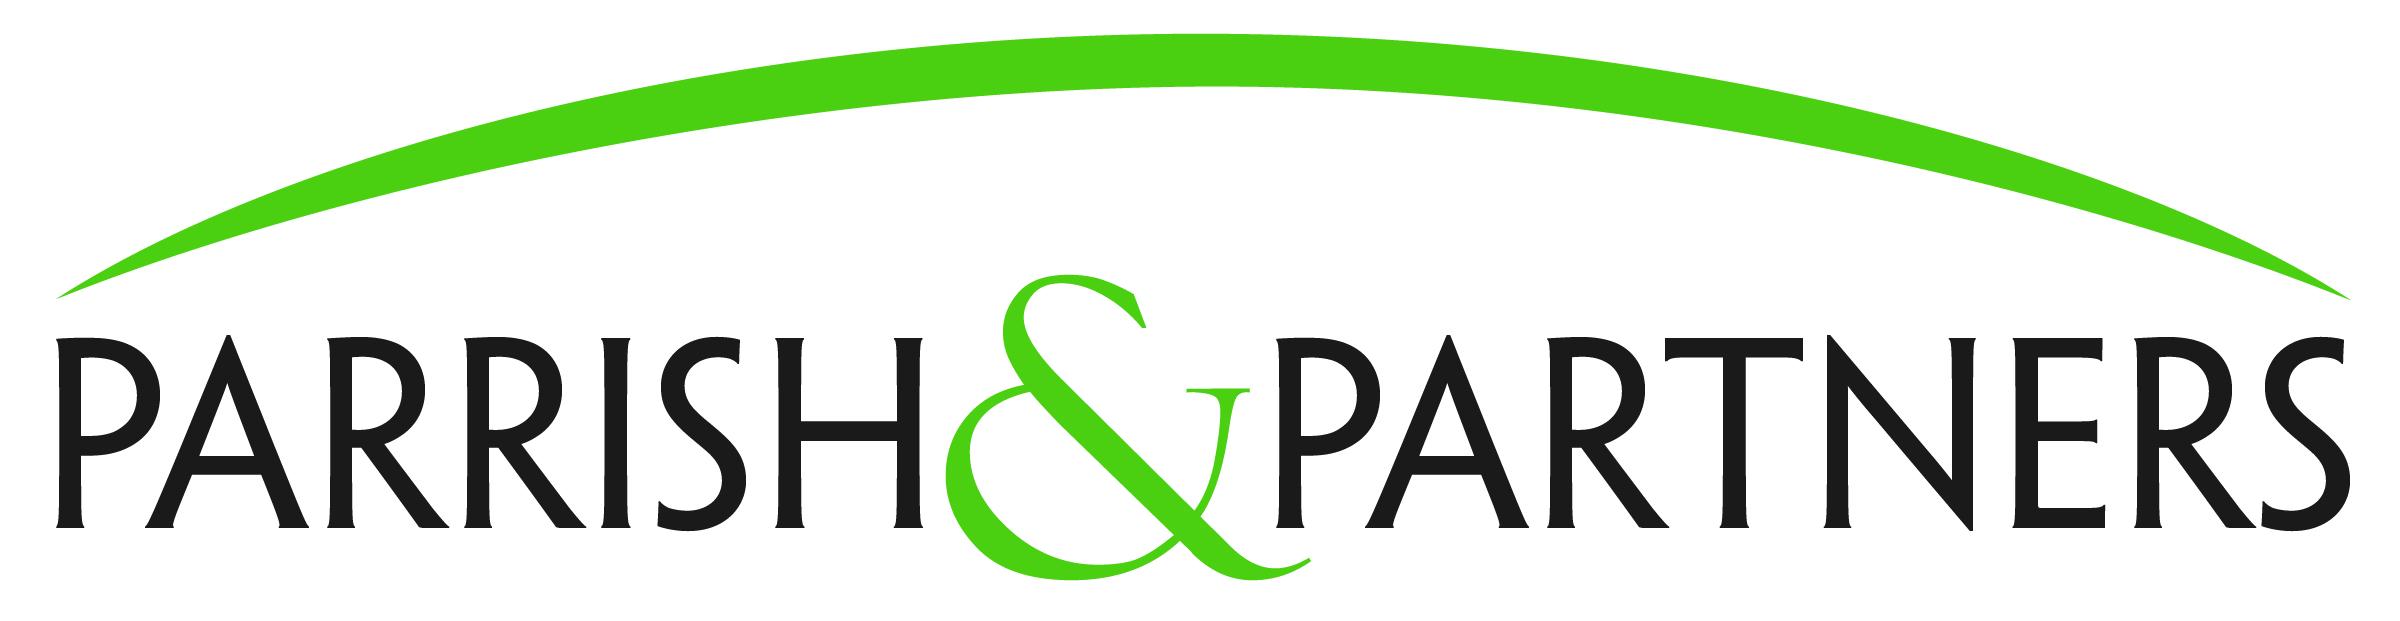 Parrish-Partners-Light-300dpi-CMYK-01.jpg